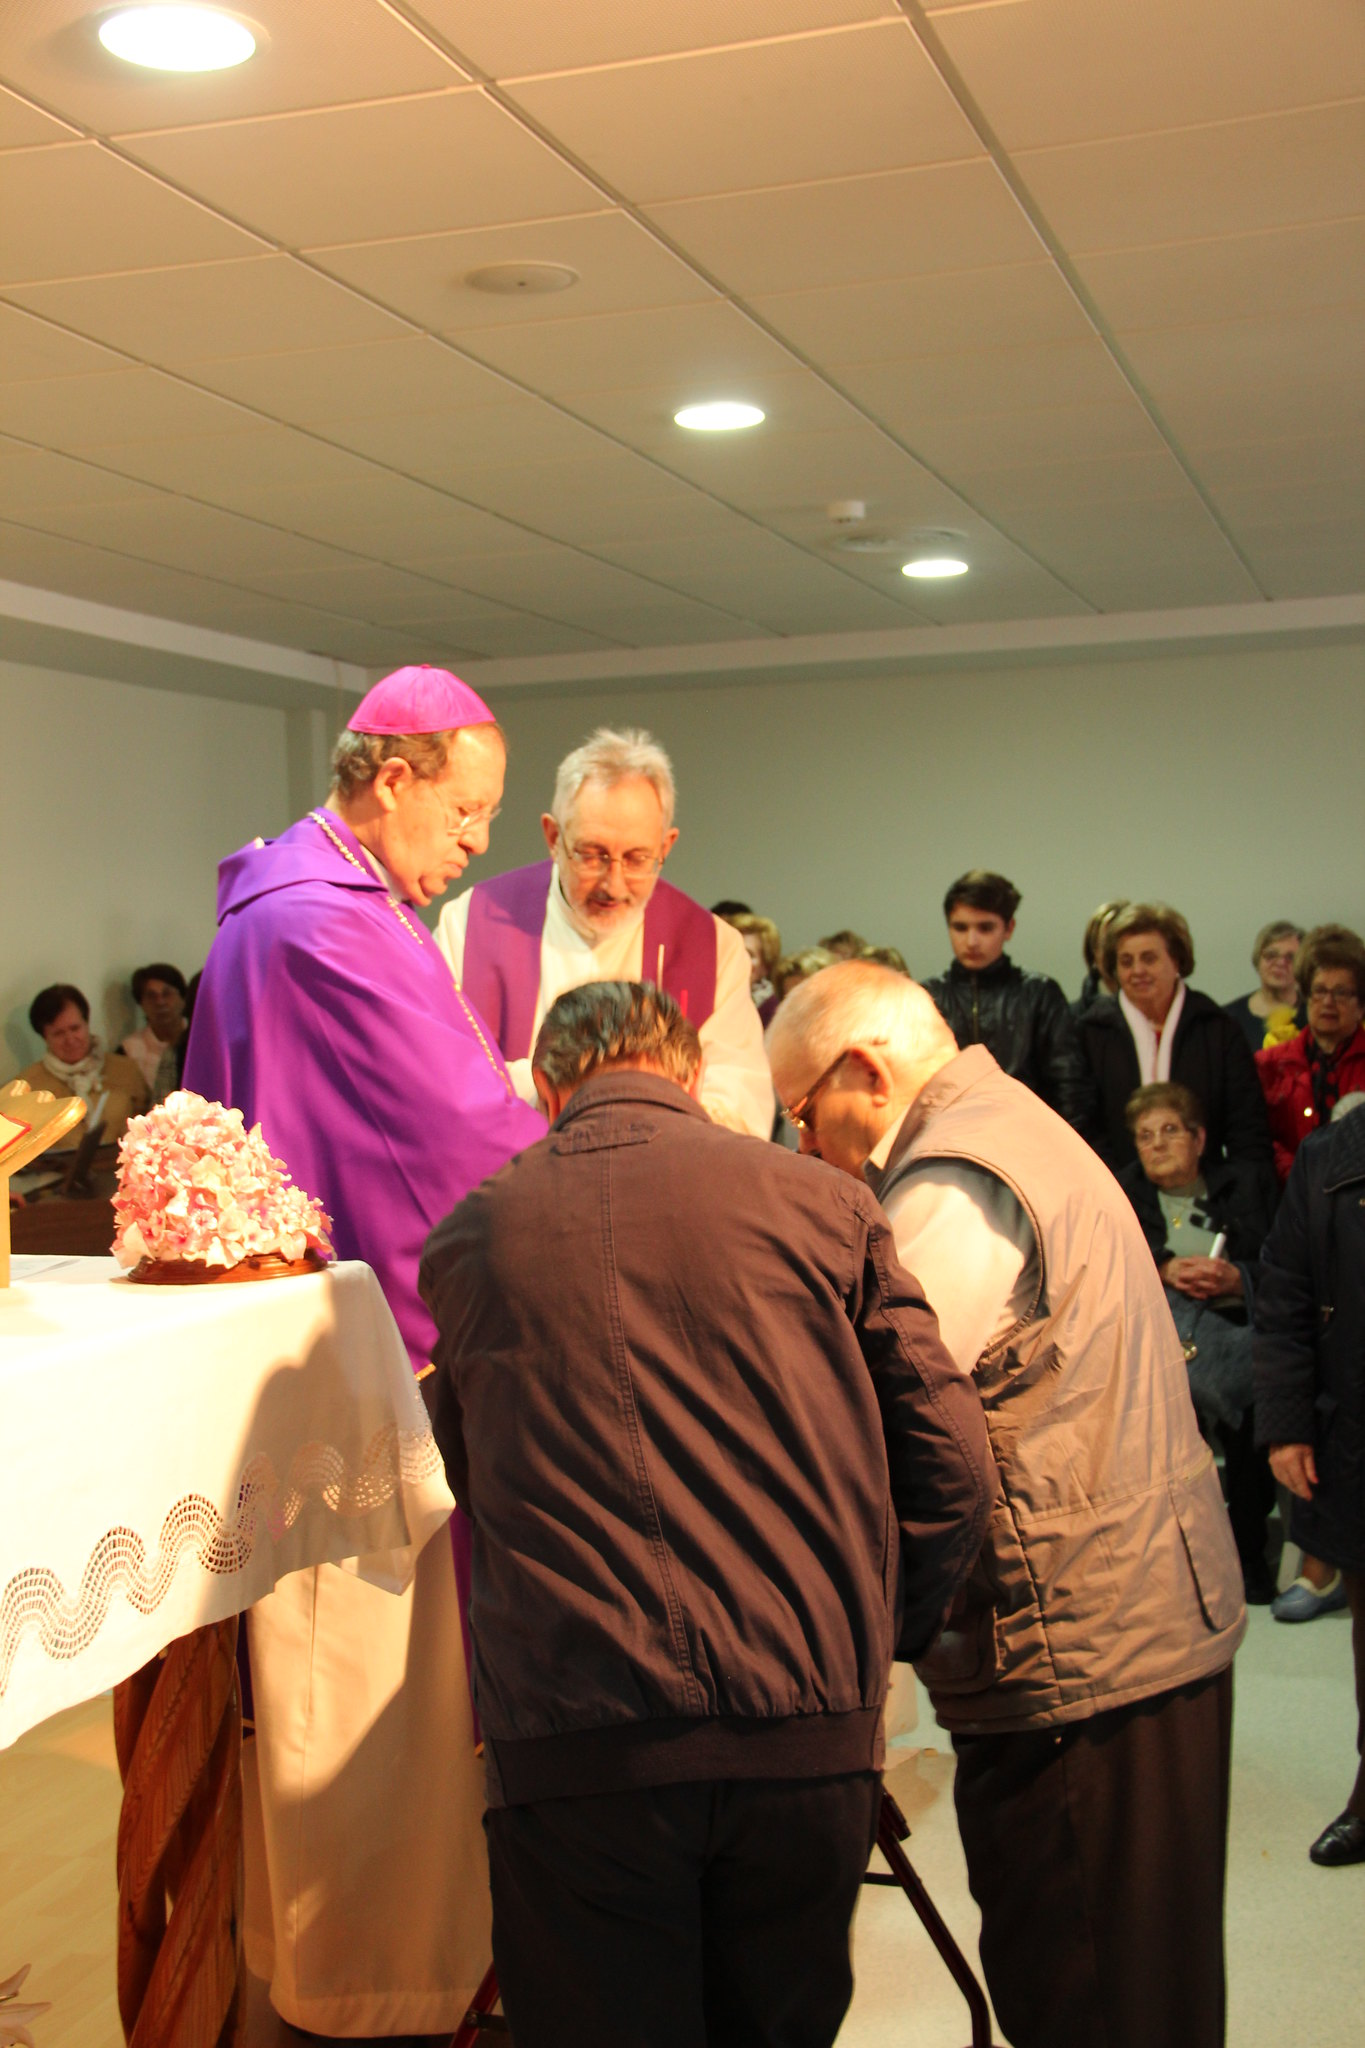 (2016-02-13) - Inauguración Virgen De Lourdes, La Molineta - Archivo La Molineta (036)